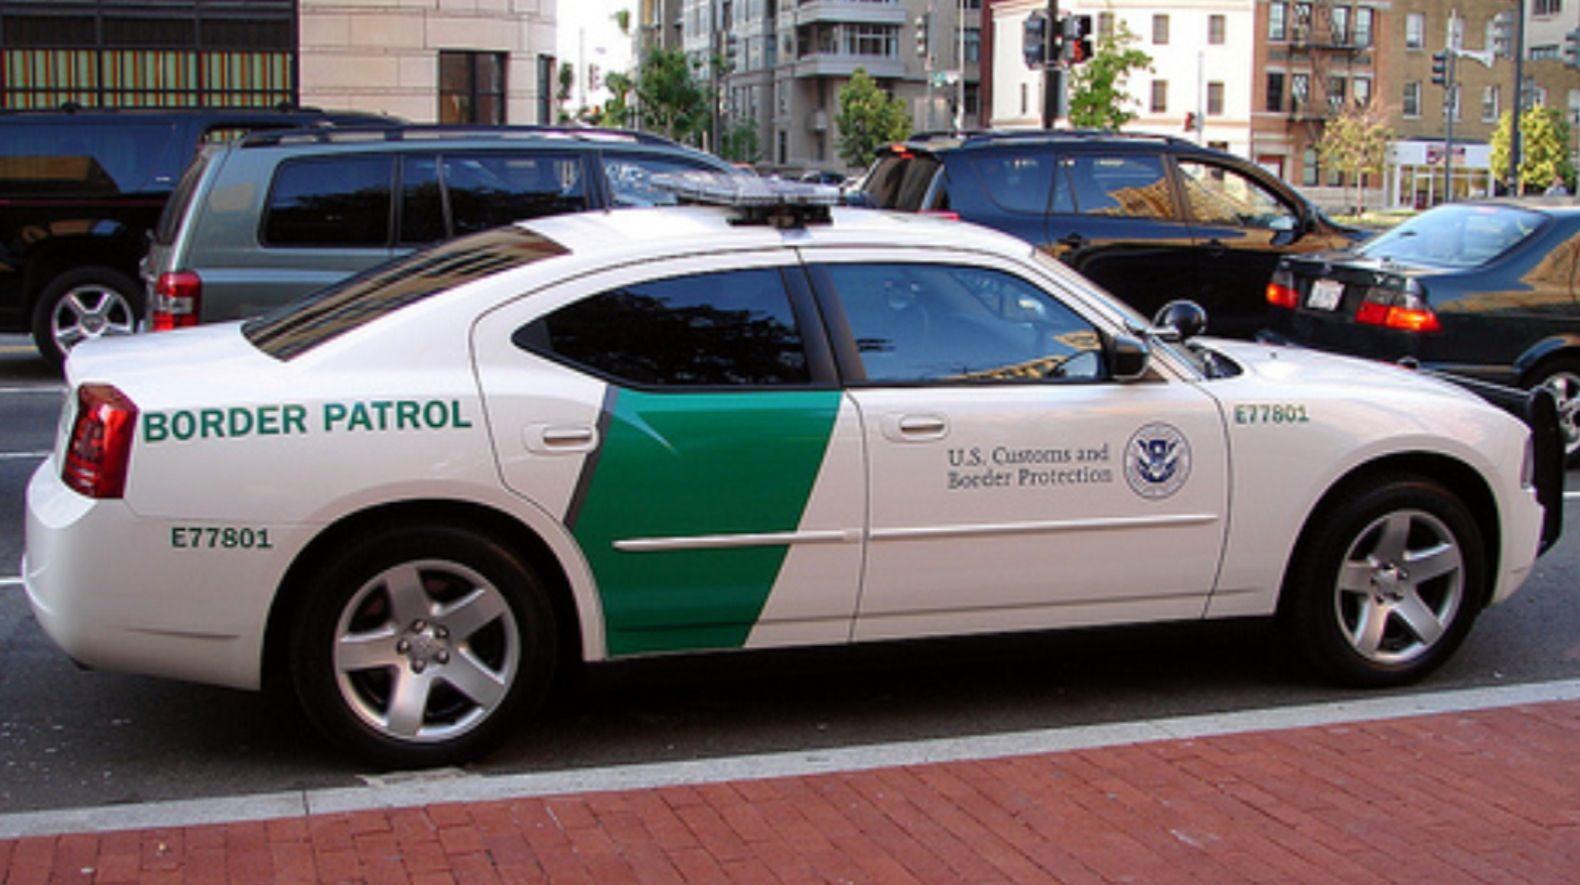 U S Border Patrol Dodge Charger Police Cars Emergency Vehicles Border Patrol